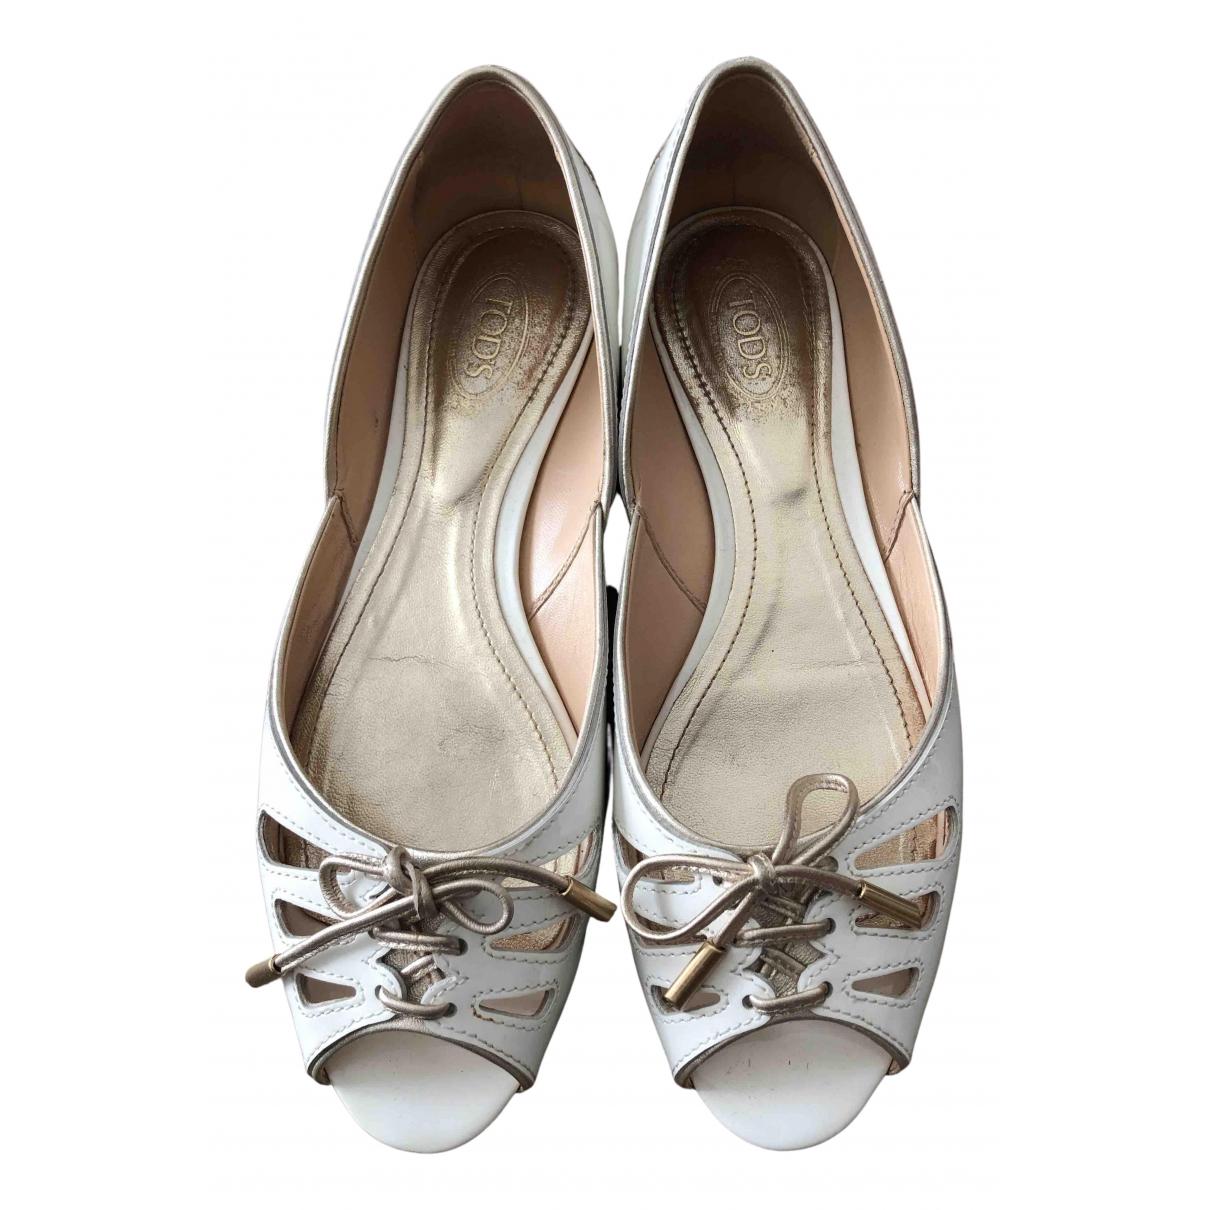 Tods \N Ballerinas in  Weiss Lackleder